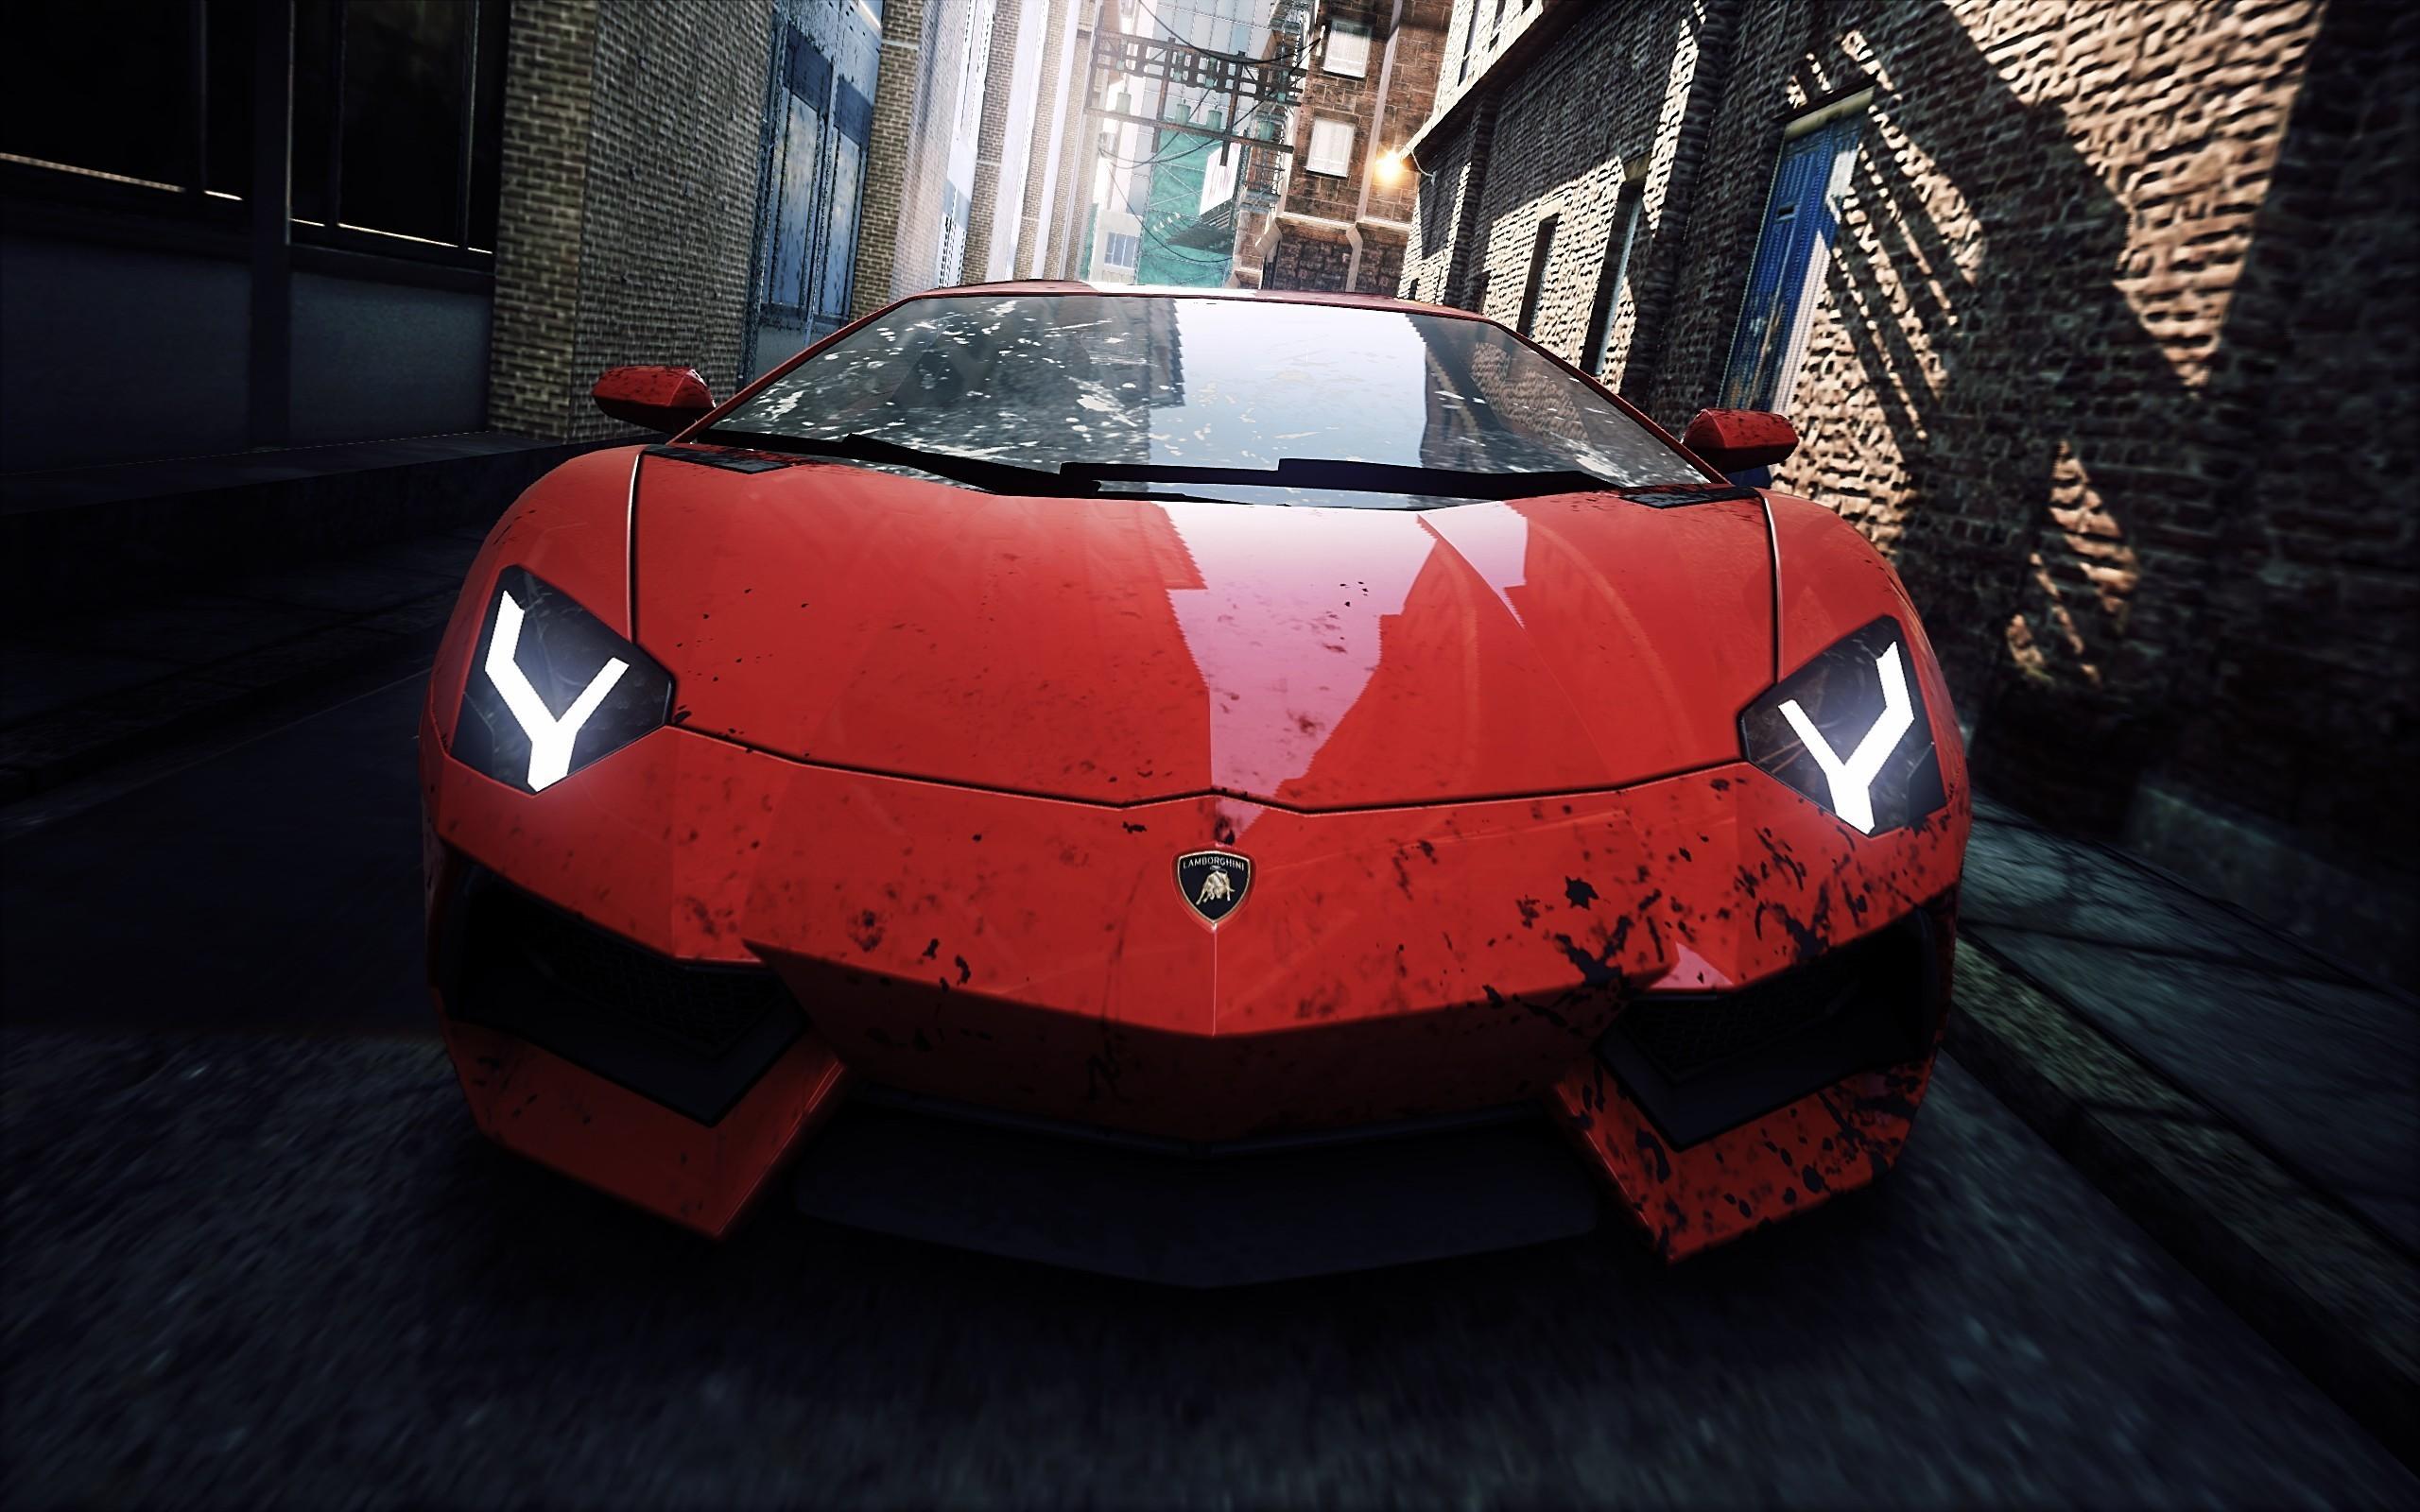 Lamborghini In Nfs Most Wanted 2012 Wallpaper Hd Car Wallpapers